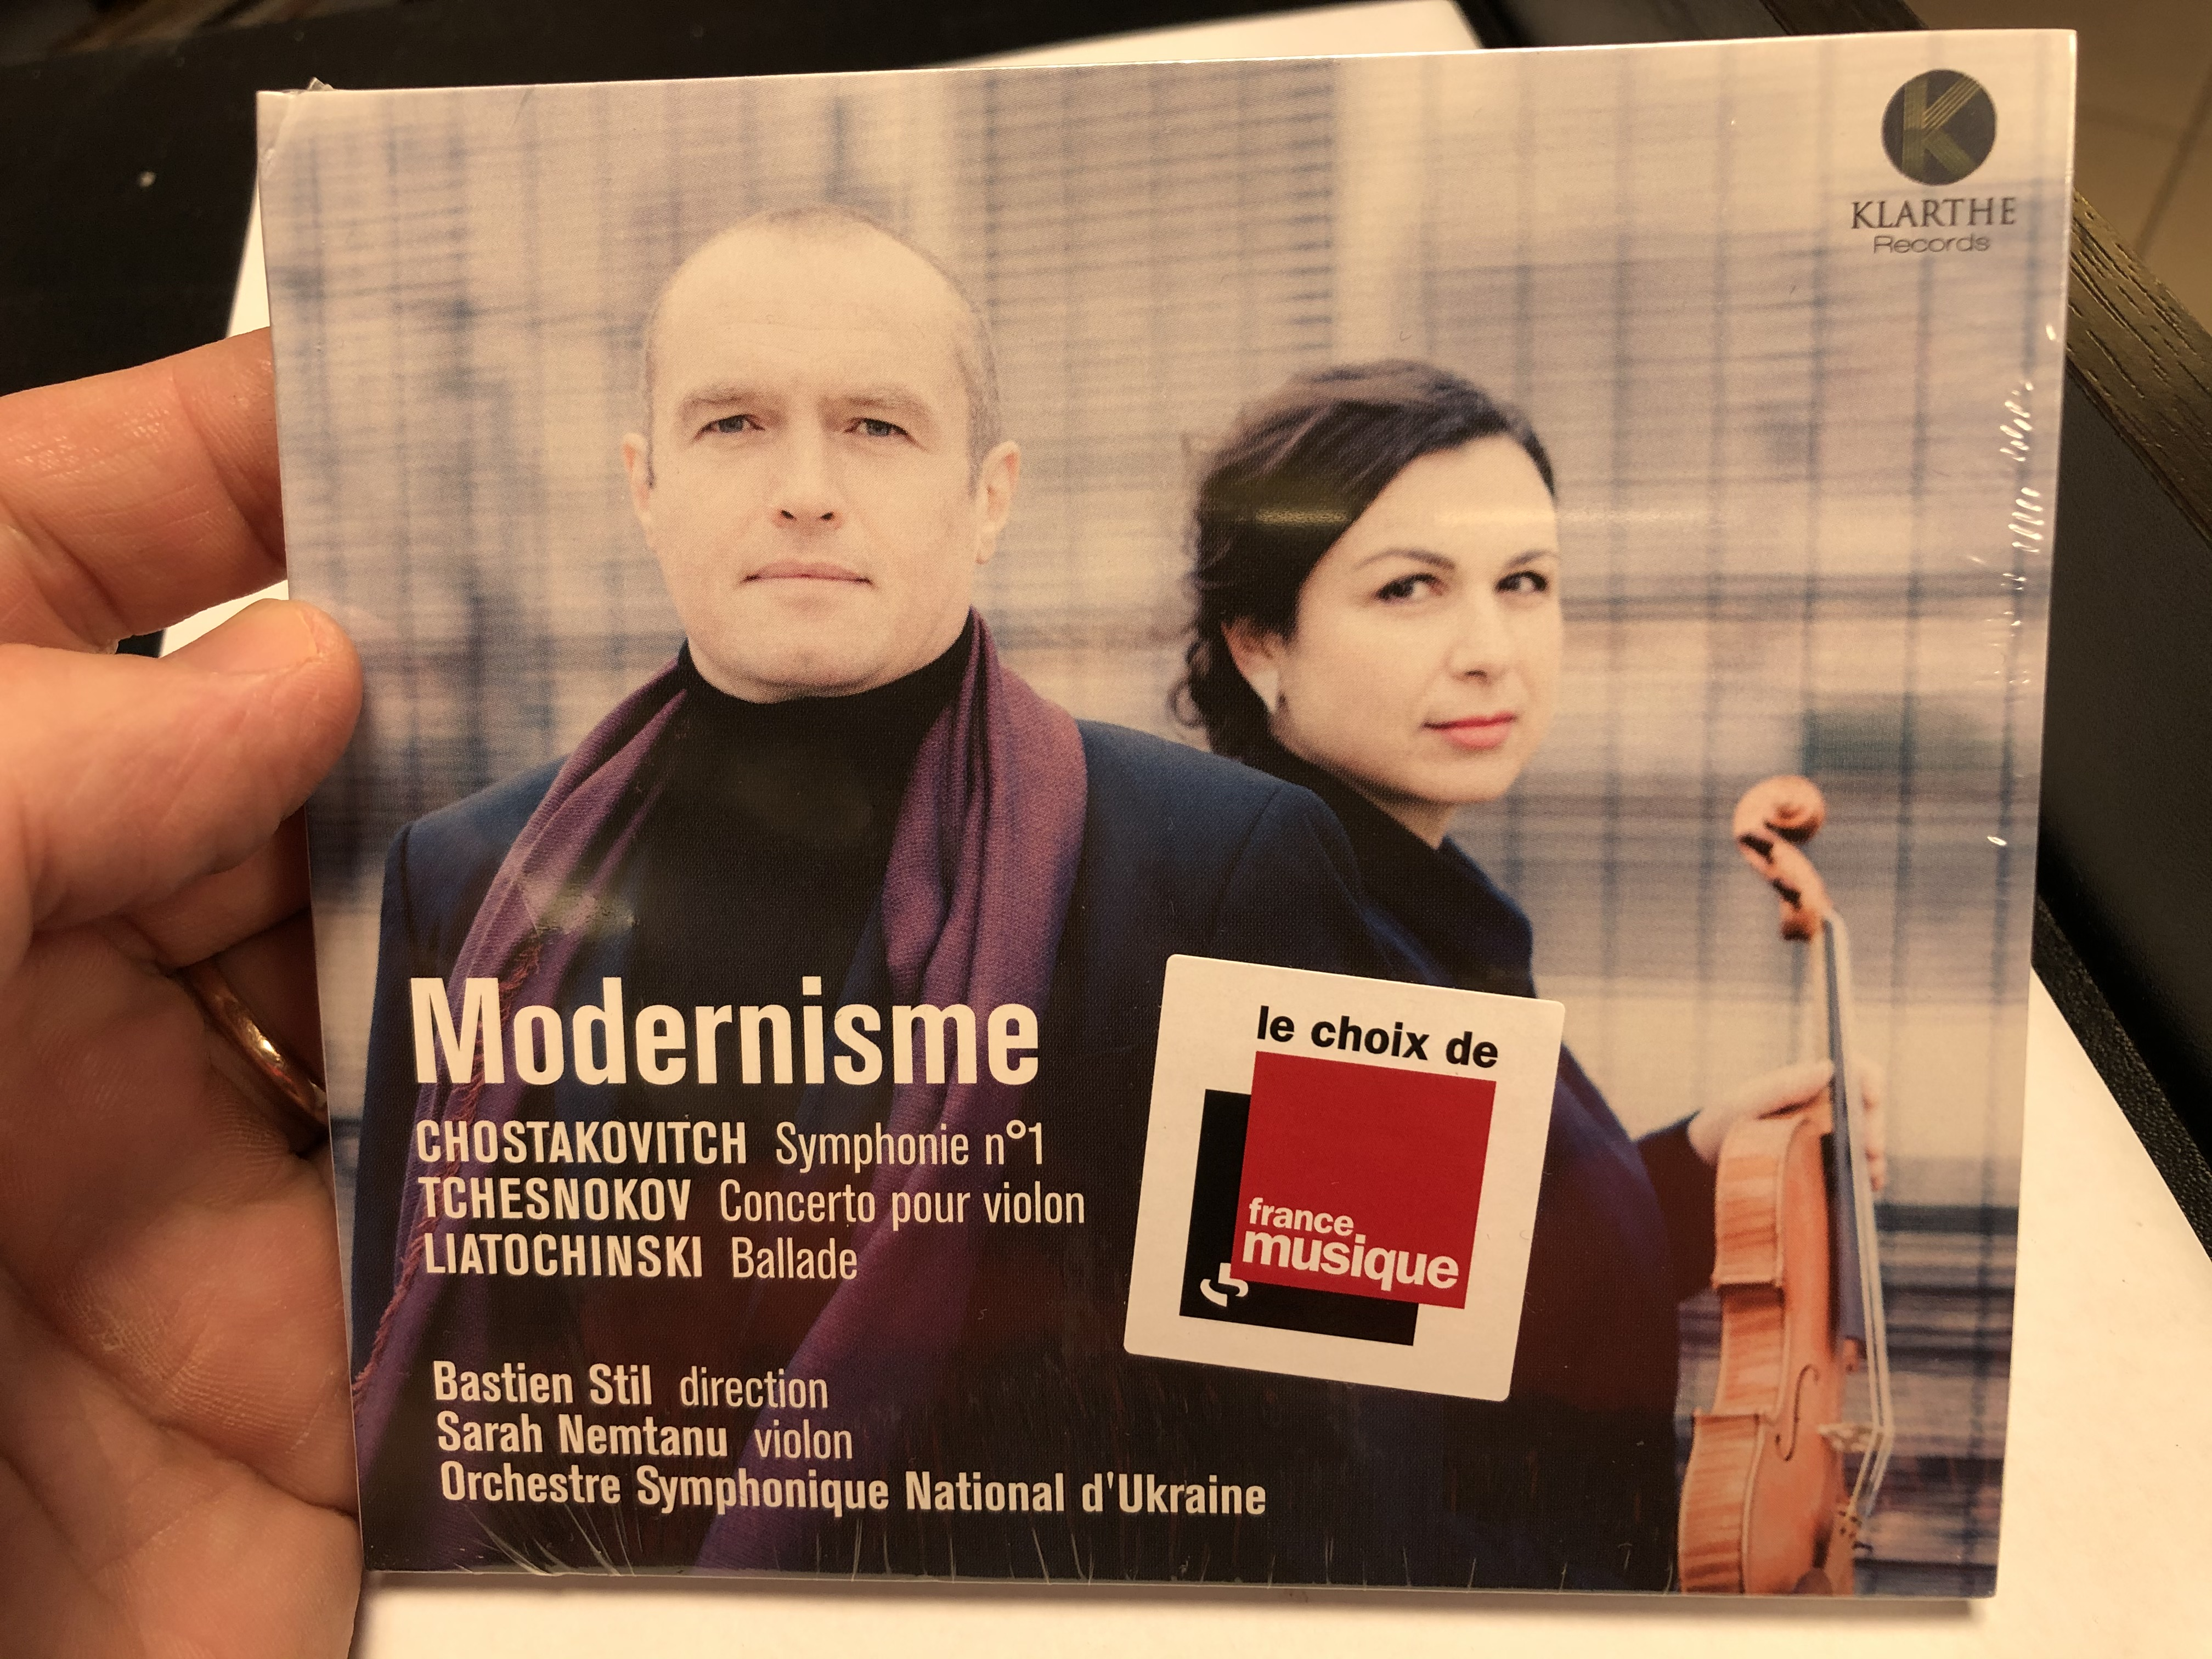 modernisme-chostakovitch-symphonie-no1-tchesnokov-concerto-pour-violon-liatochinski-ballade-bastien-stil-direction-sarah-nemtanu-violon-orchestre-symphonique-national-d-ukraine-1-.jpg